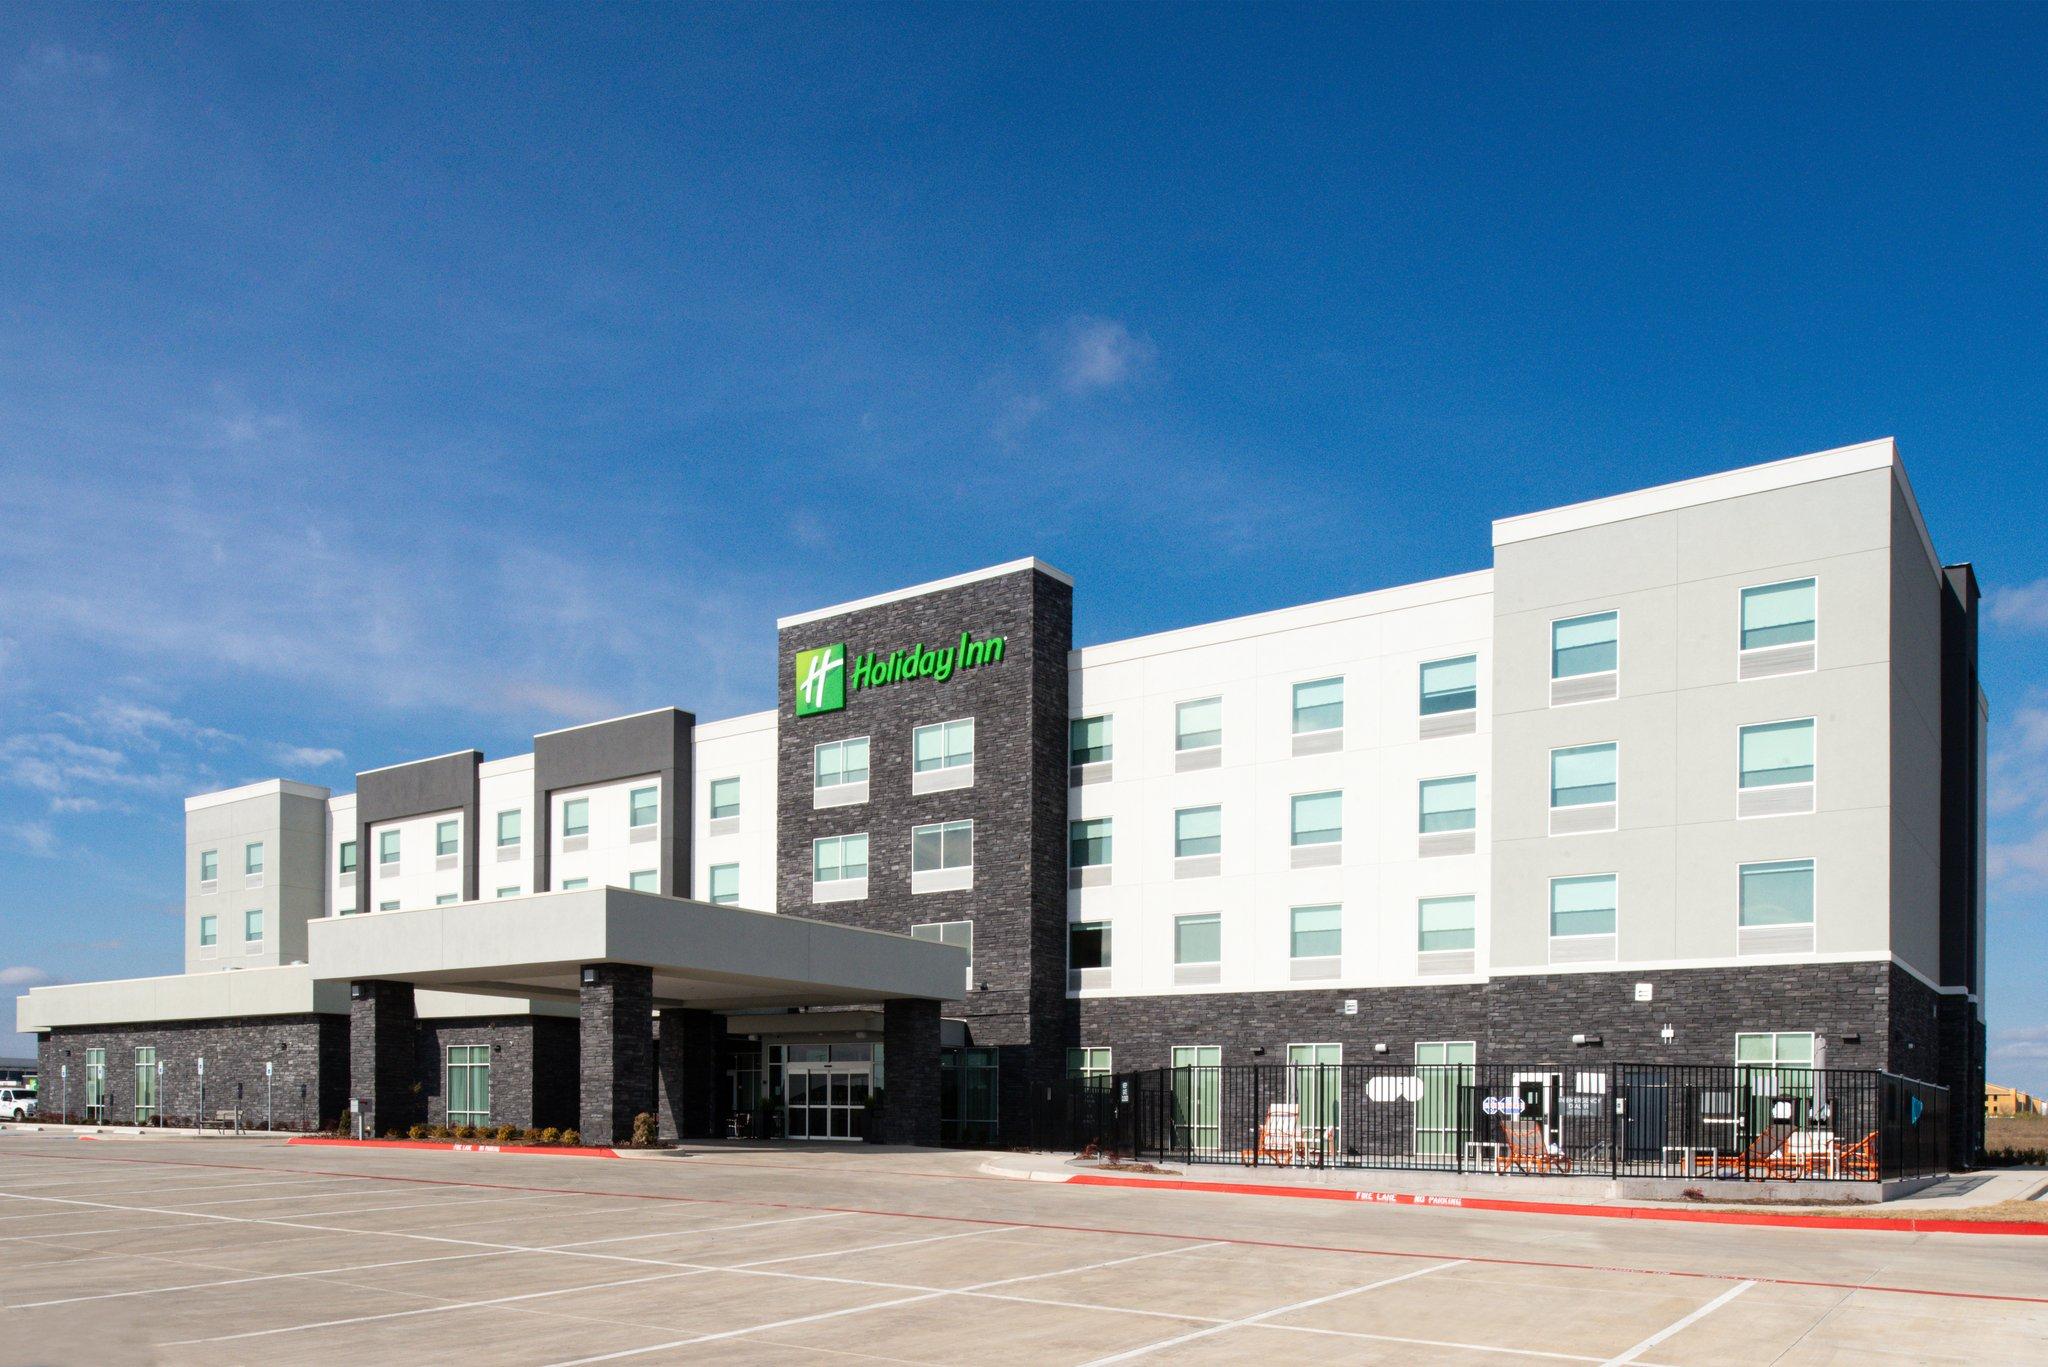 Holiday Inn FORT WORTH - ALLIANCE